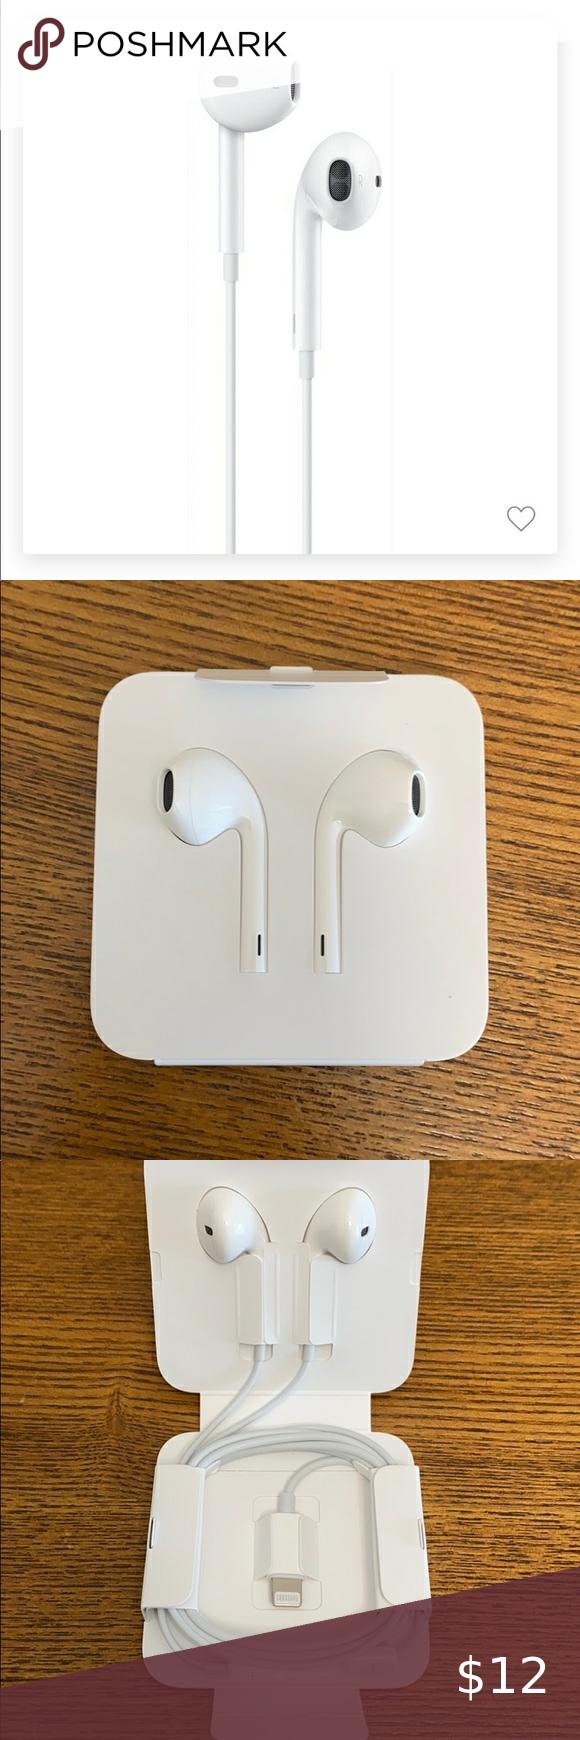 Apple Wired Earpods Apple Apple Accessories Wire